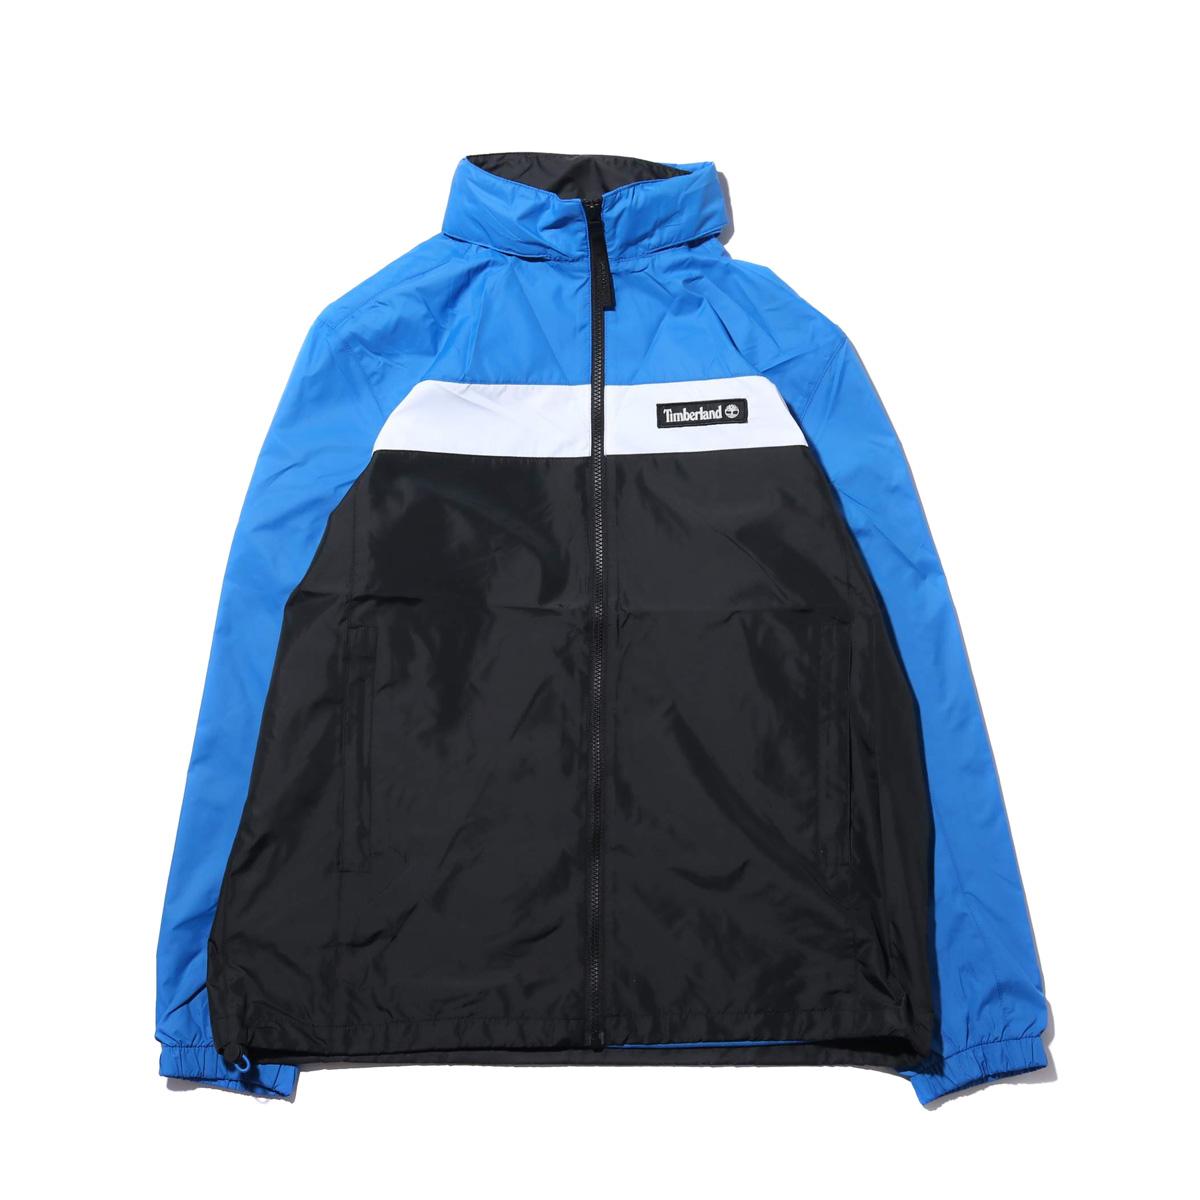 Timberland YCC Hooded full zip jacket(STRONG BLUE/BLACK)(ティンバーランド YCC フーデッド フルジップ ジャケット)【メンズ】【ジャケット】【19SS-I】